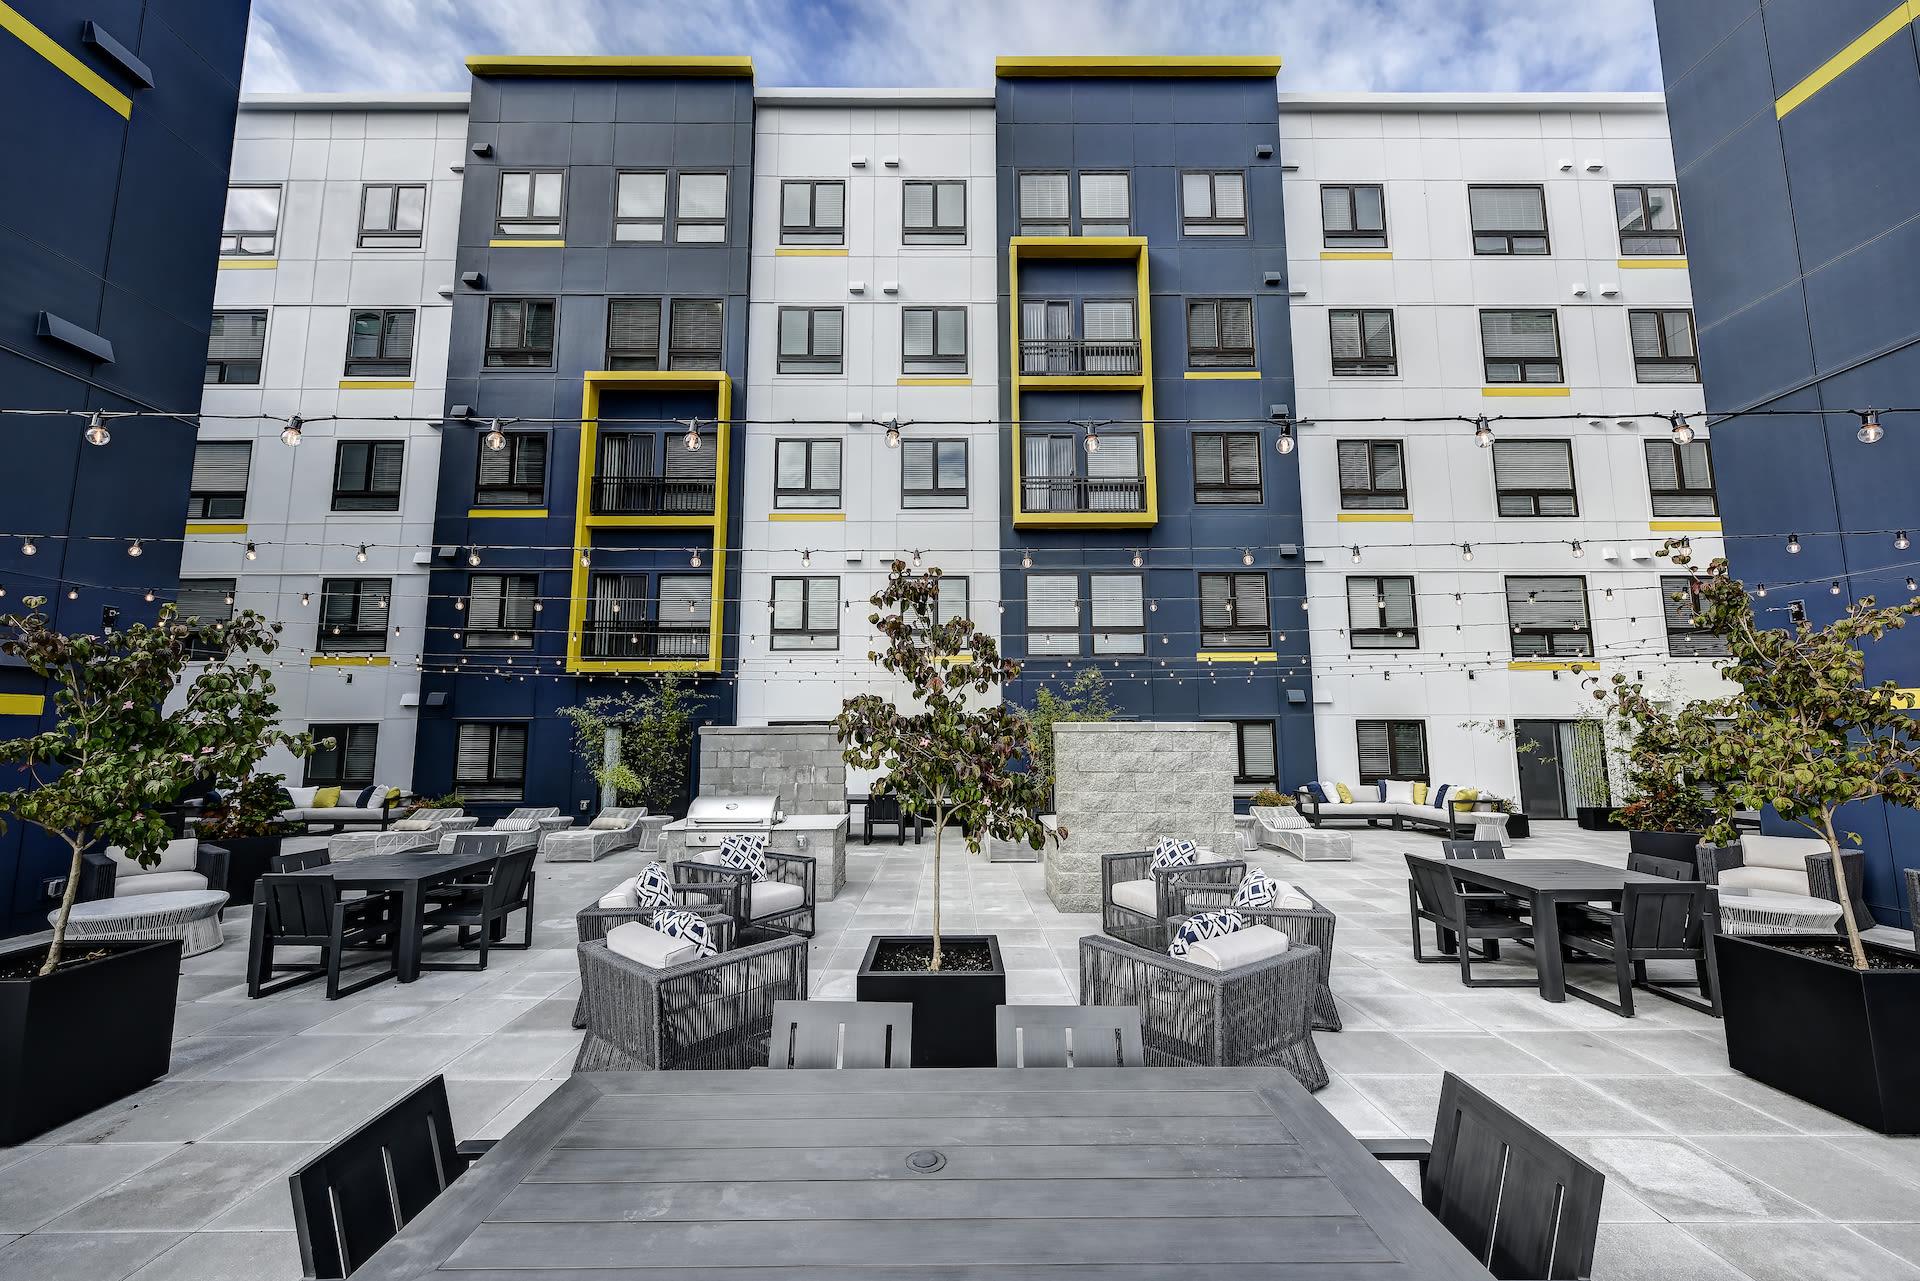 Kinect @ Broadway apartments in Everett, Washington